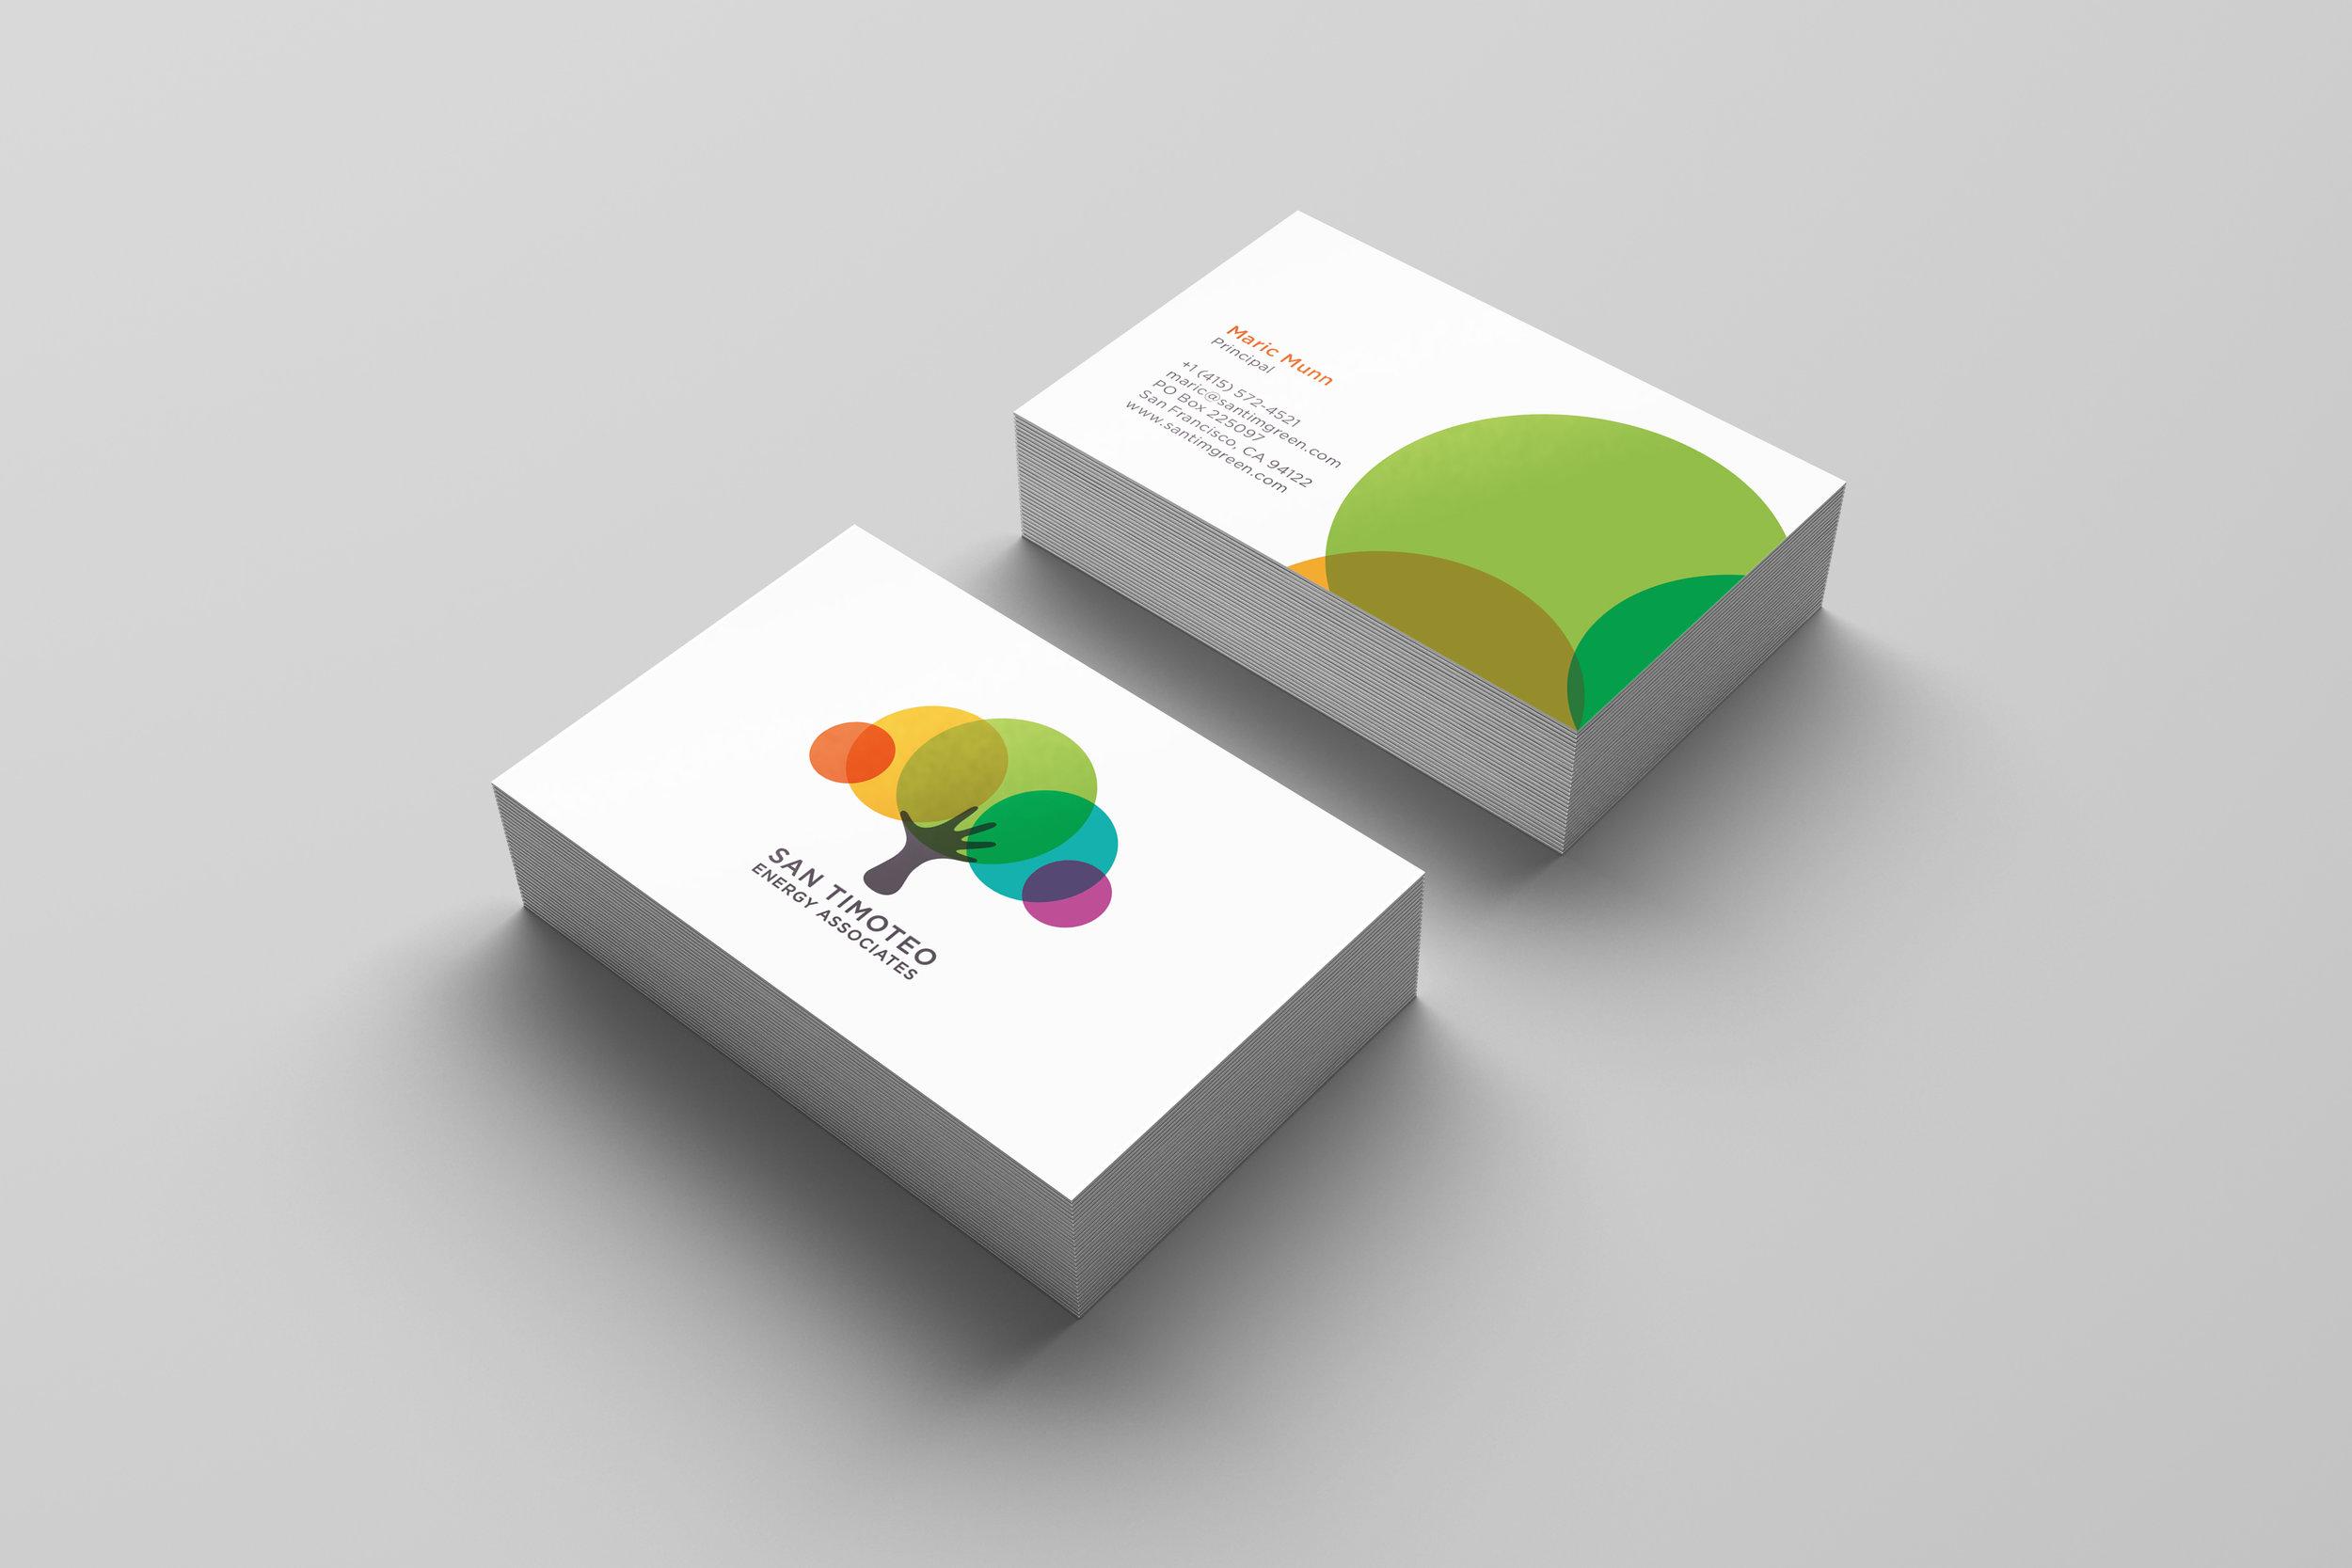 SanT_business-card-mockup_2.jpg